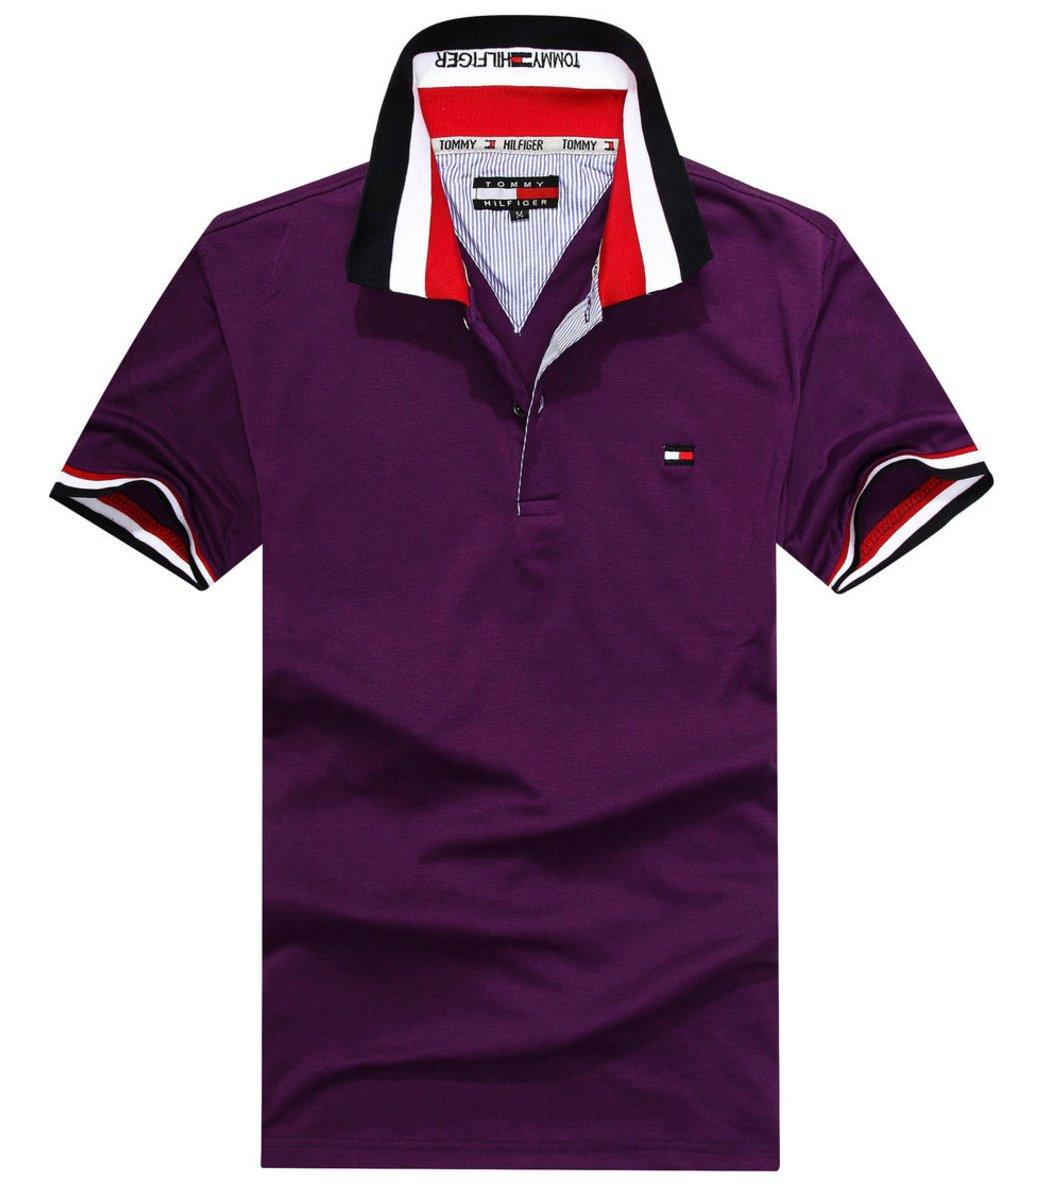 Мужская фиолетовая футболка поло Tommy Hilfiger